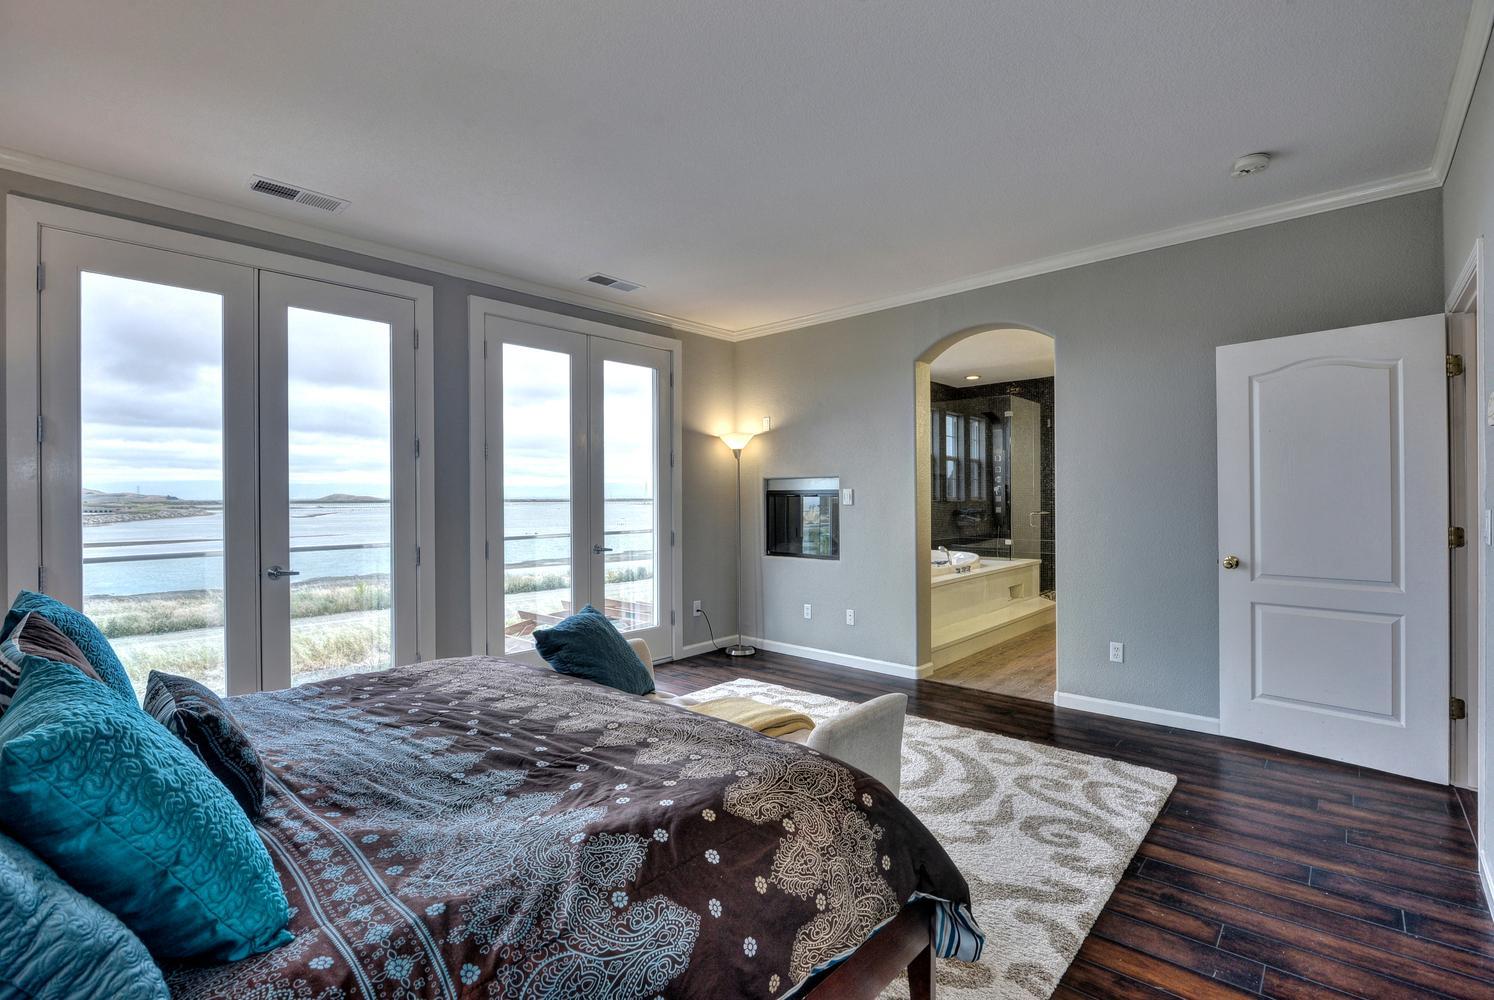 29180 Marshbrook Dr Hayward CA-large-015-Master Bedroom View-1494x1000-72dpi.jpg